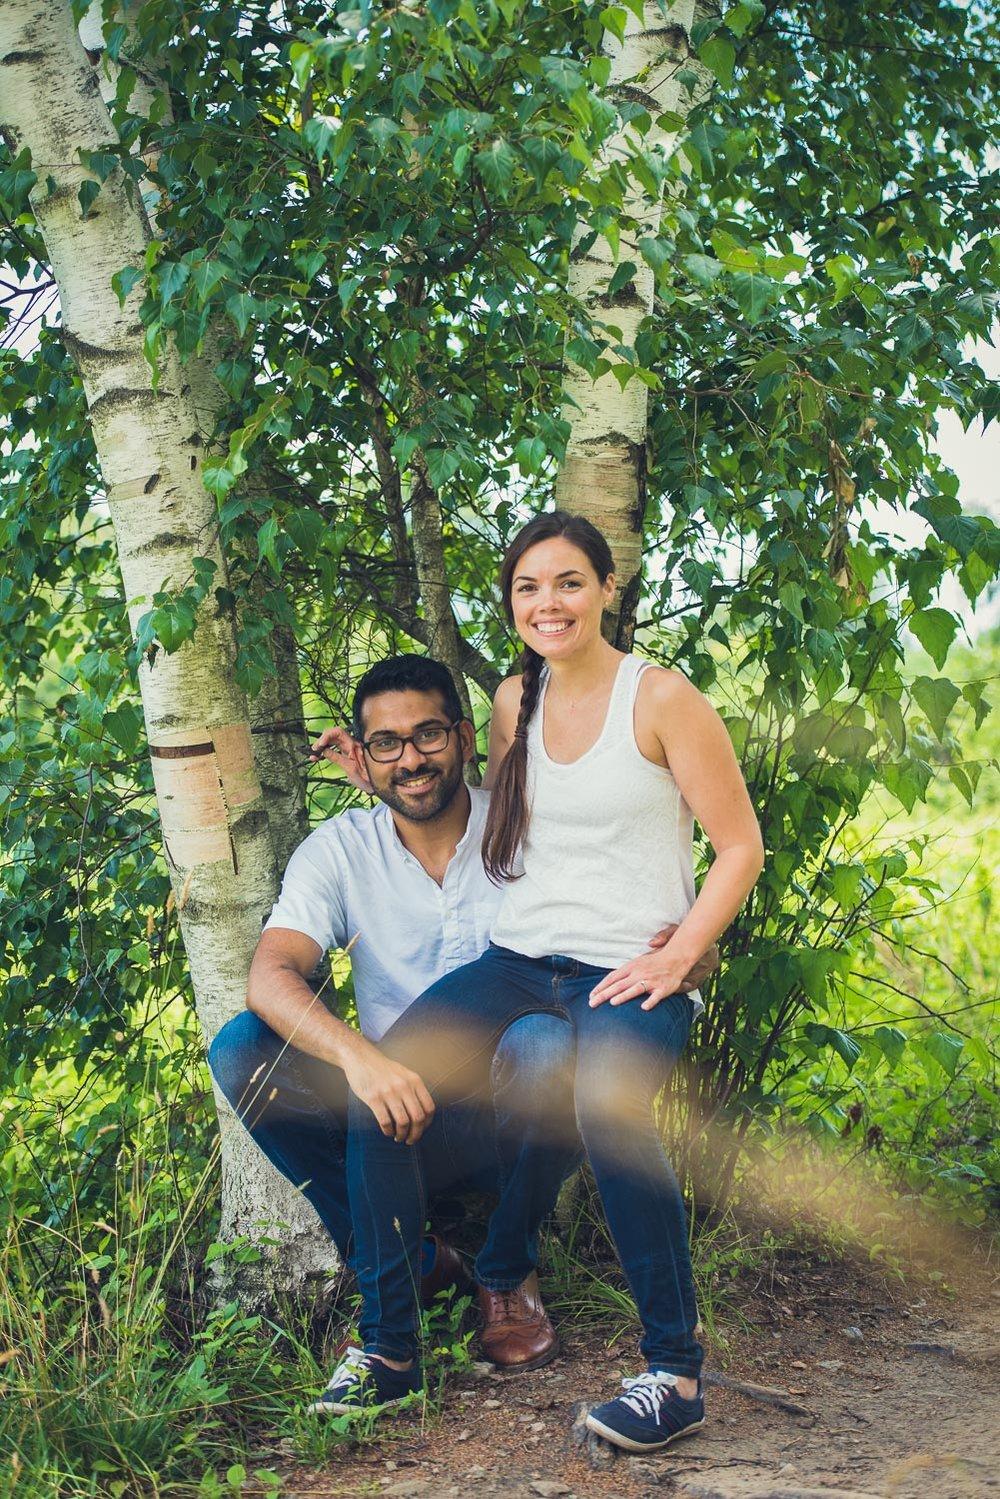 20170708 - Tiffany Pranshu Engagement LR-38.jpg